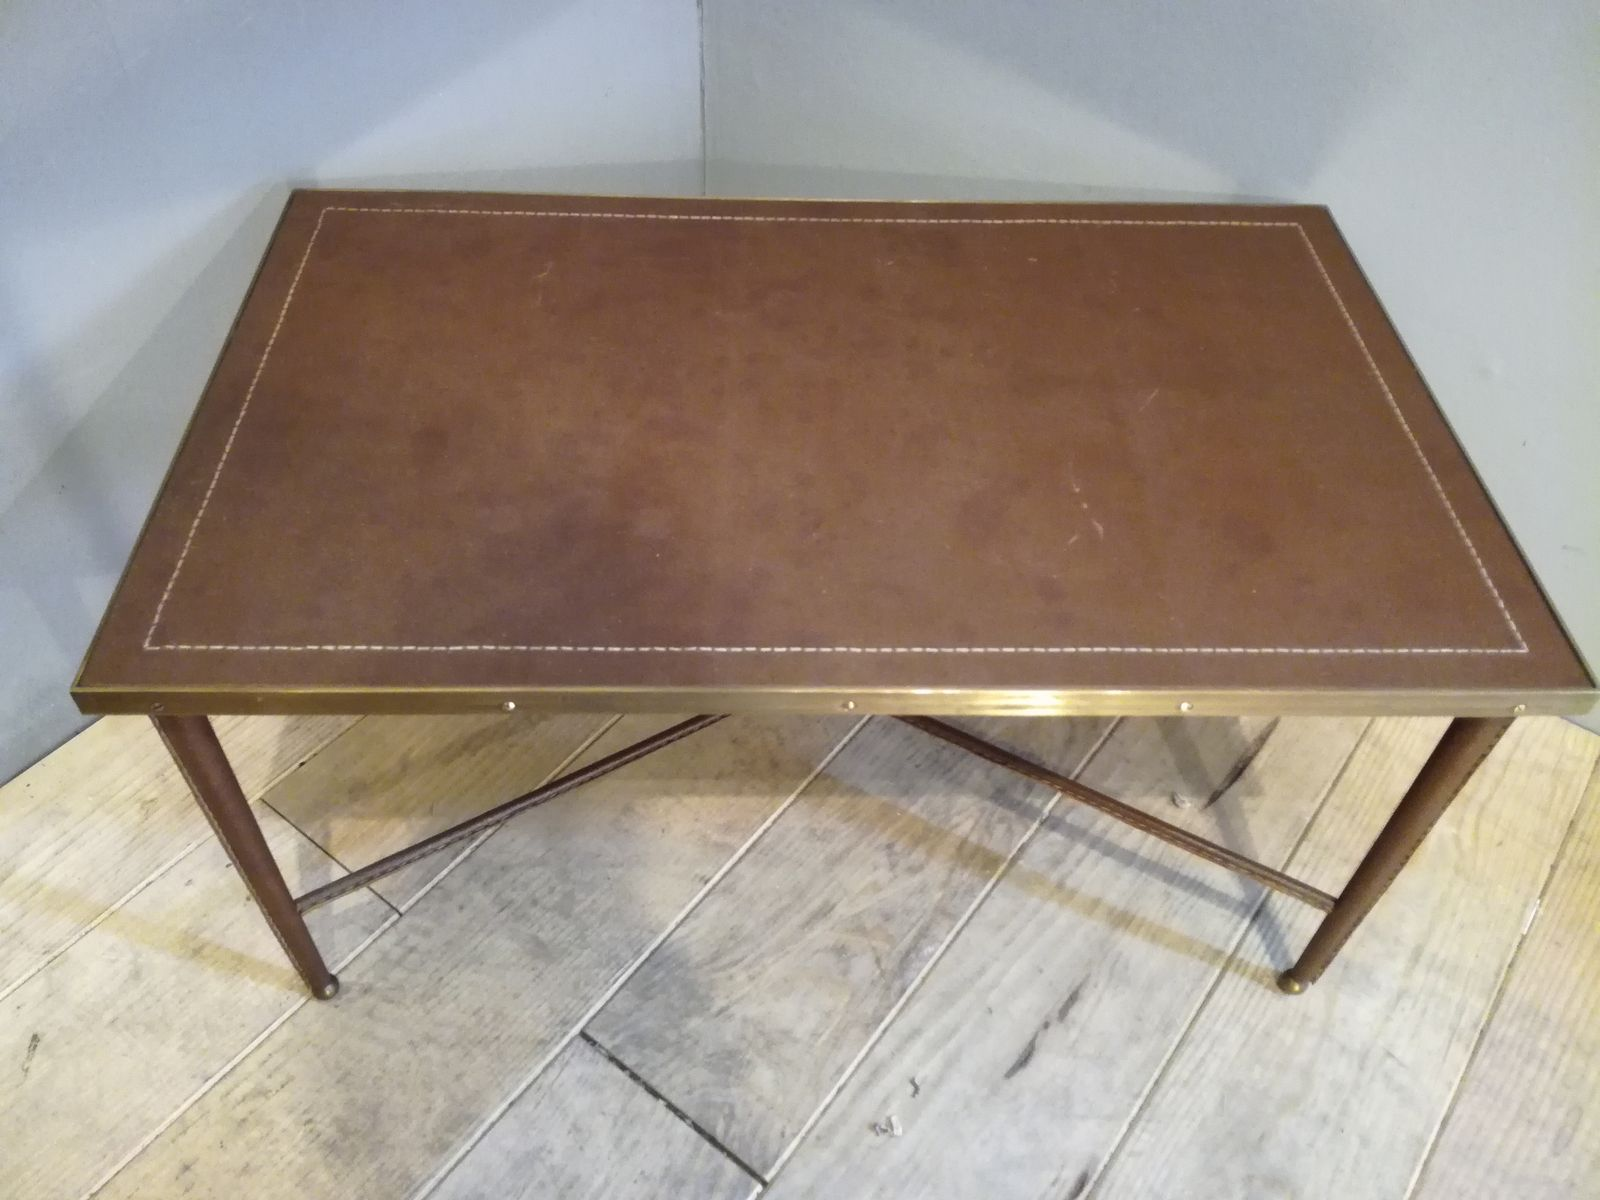 table basse vintage recouverte de cuir en vente sur pamono. Black Bedroom Furniture Sets. Home Design Ideas